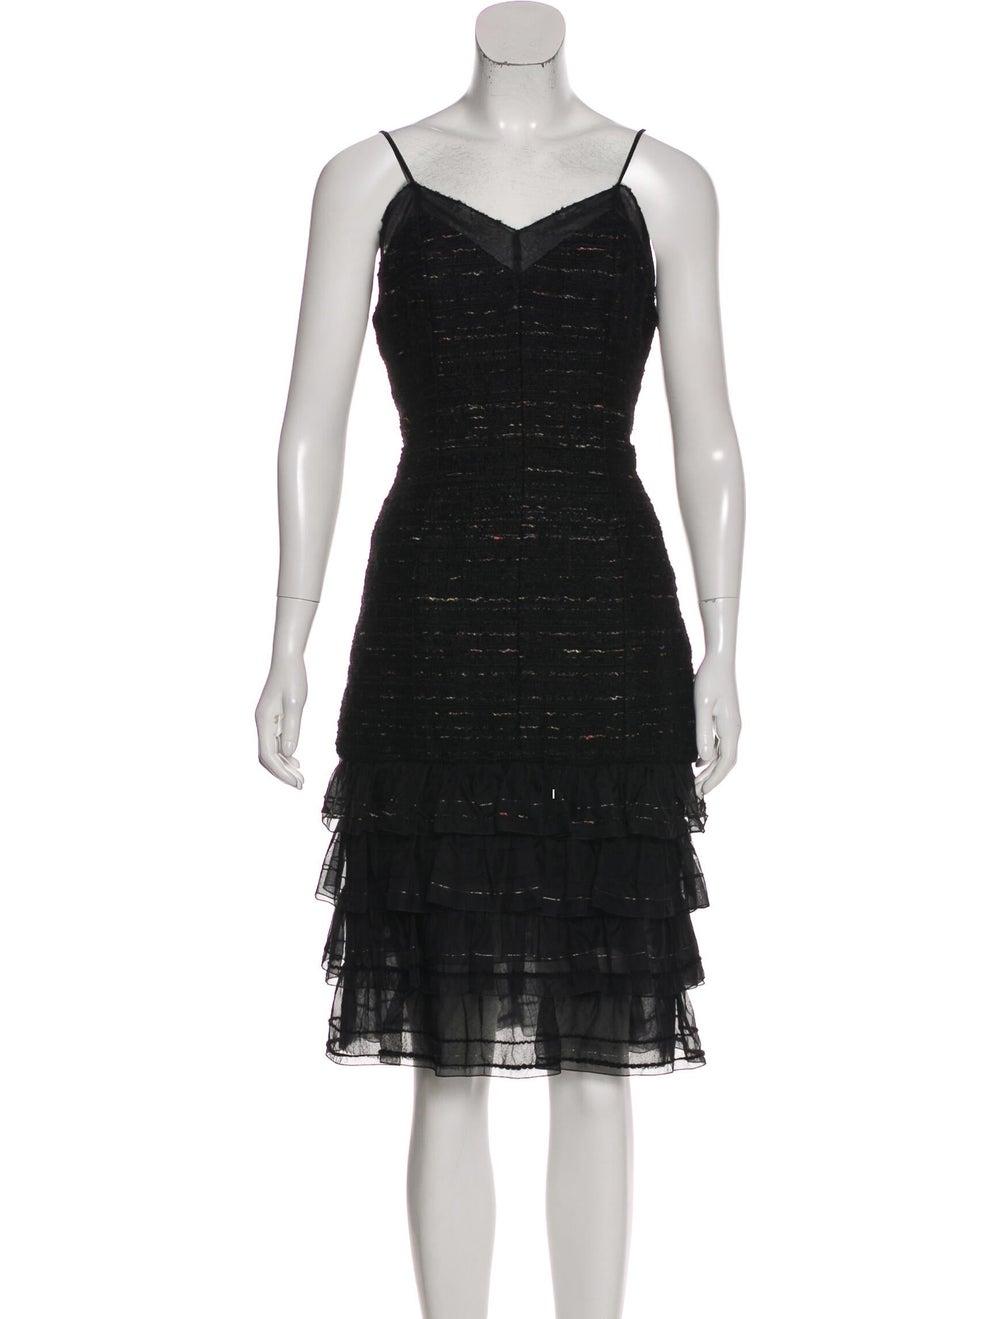 Chanel Metallic Tweed Dress Set Black - image 4